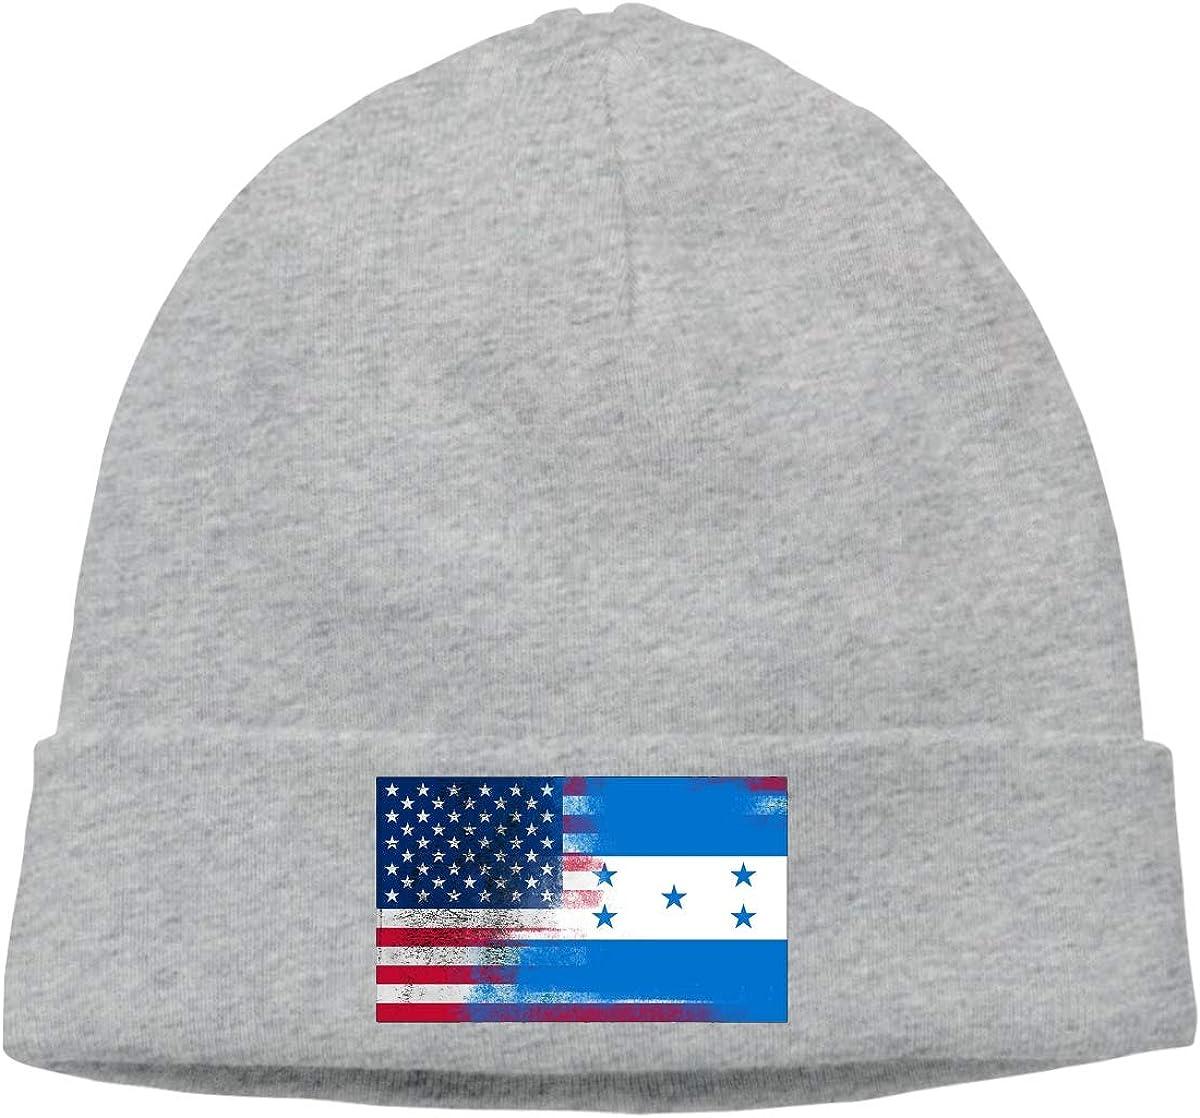 Honduras American Flag CgyOIUY-lop Beanie Hat Warm Hats Skull Cap Knitted Hat